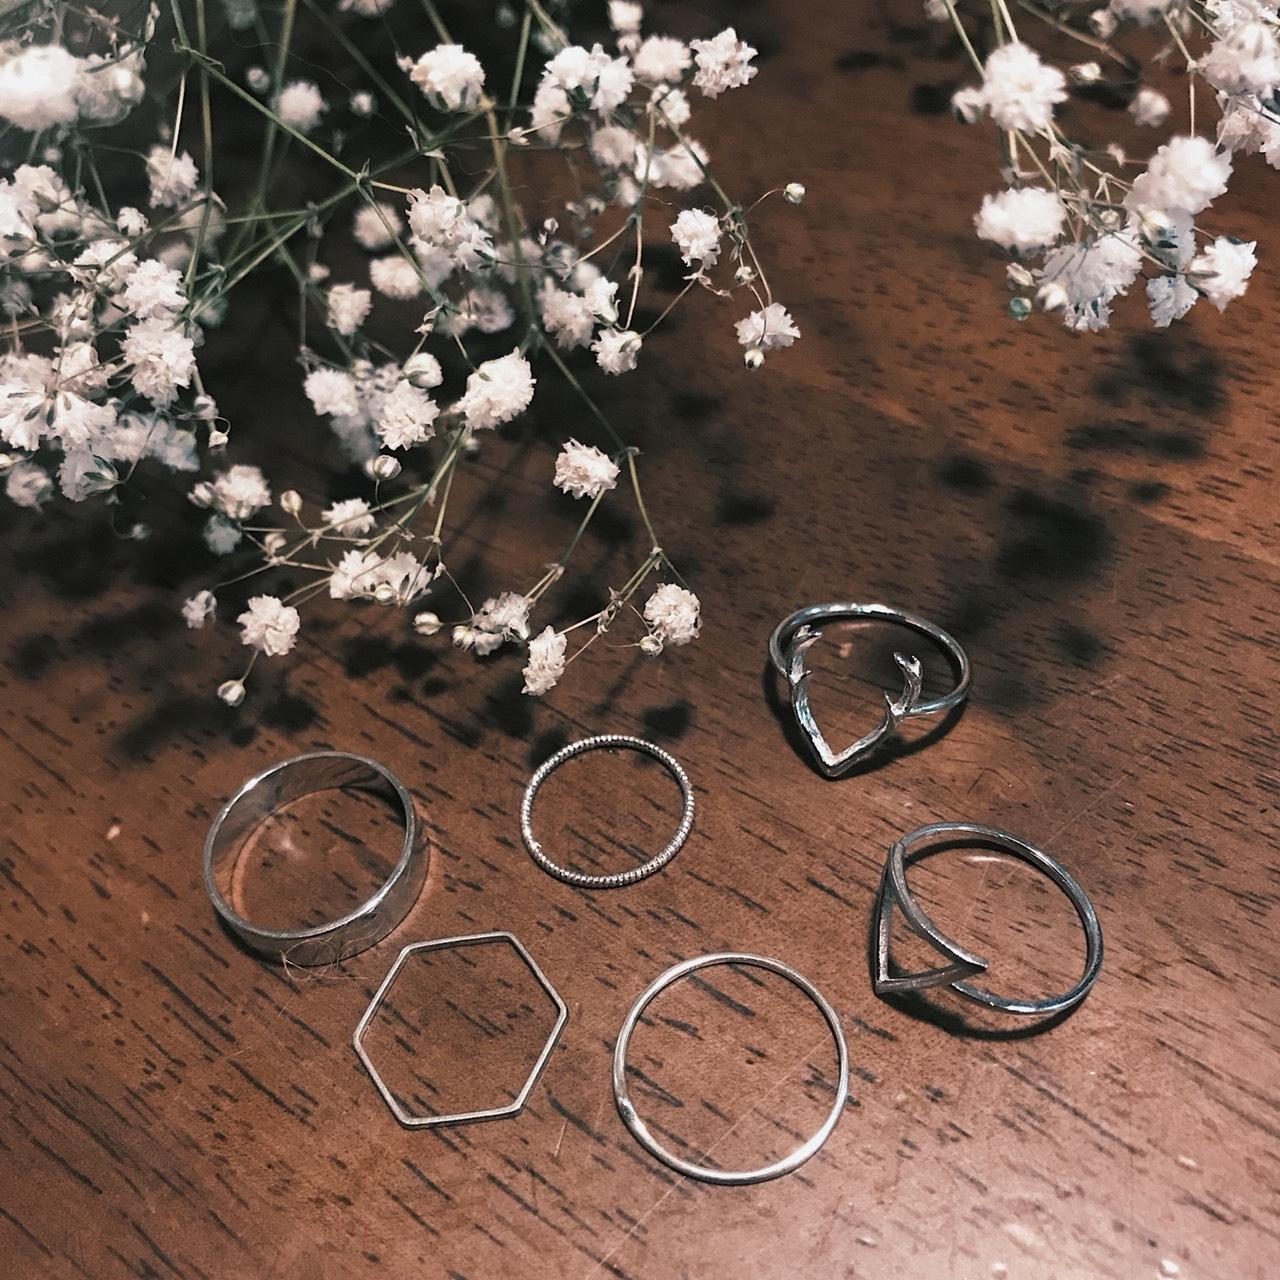 STARMARIE 高森紫乃の愛用品「指輪」